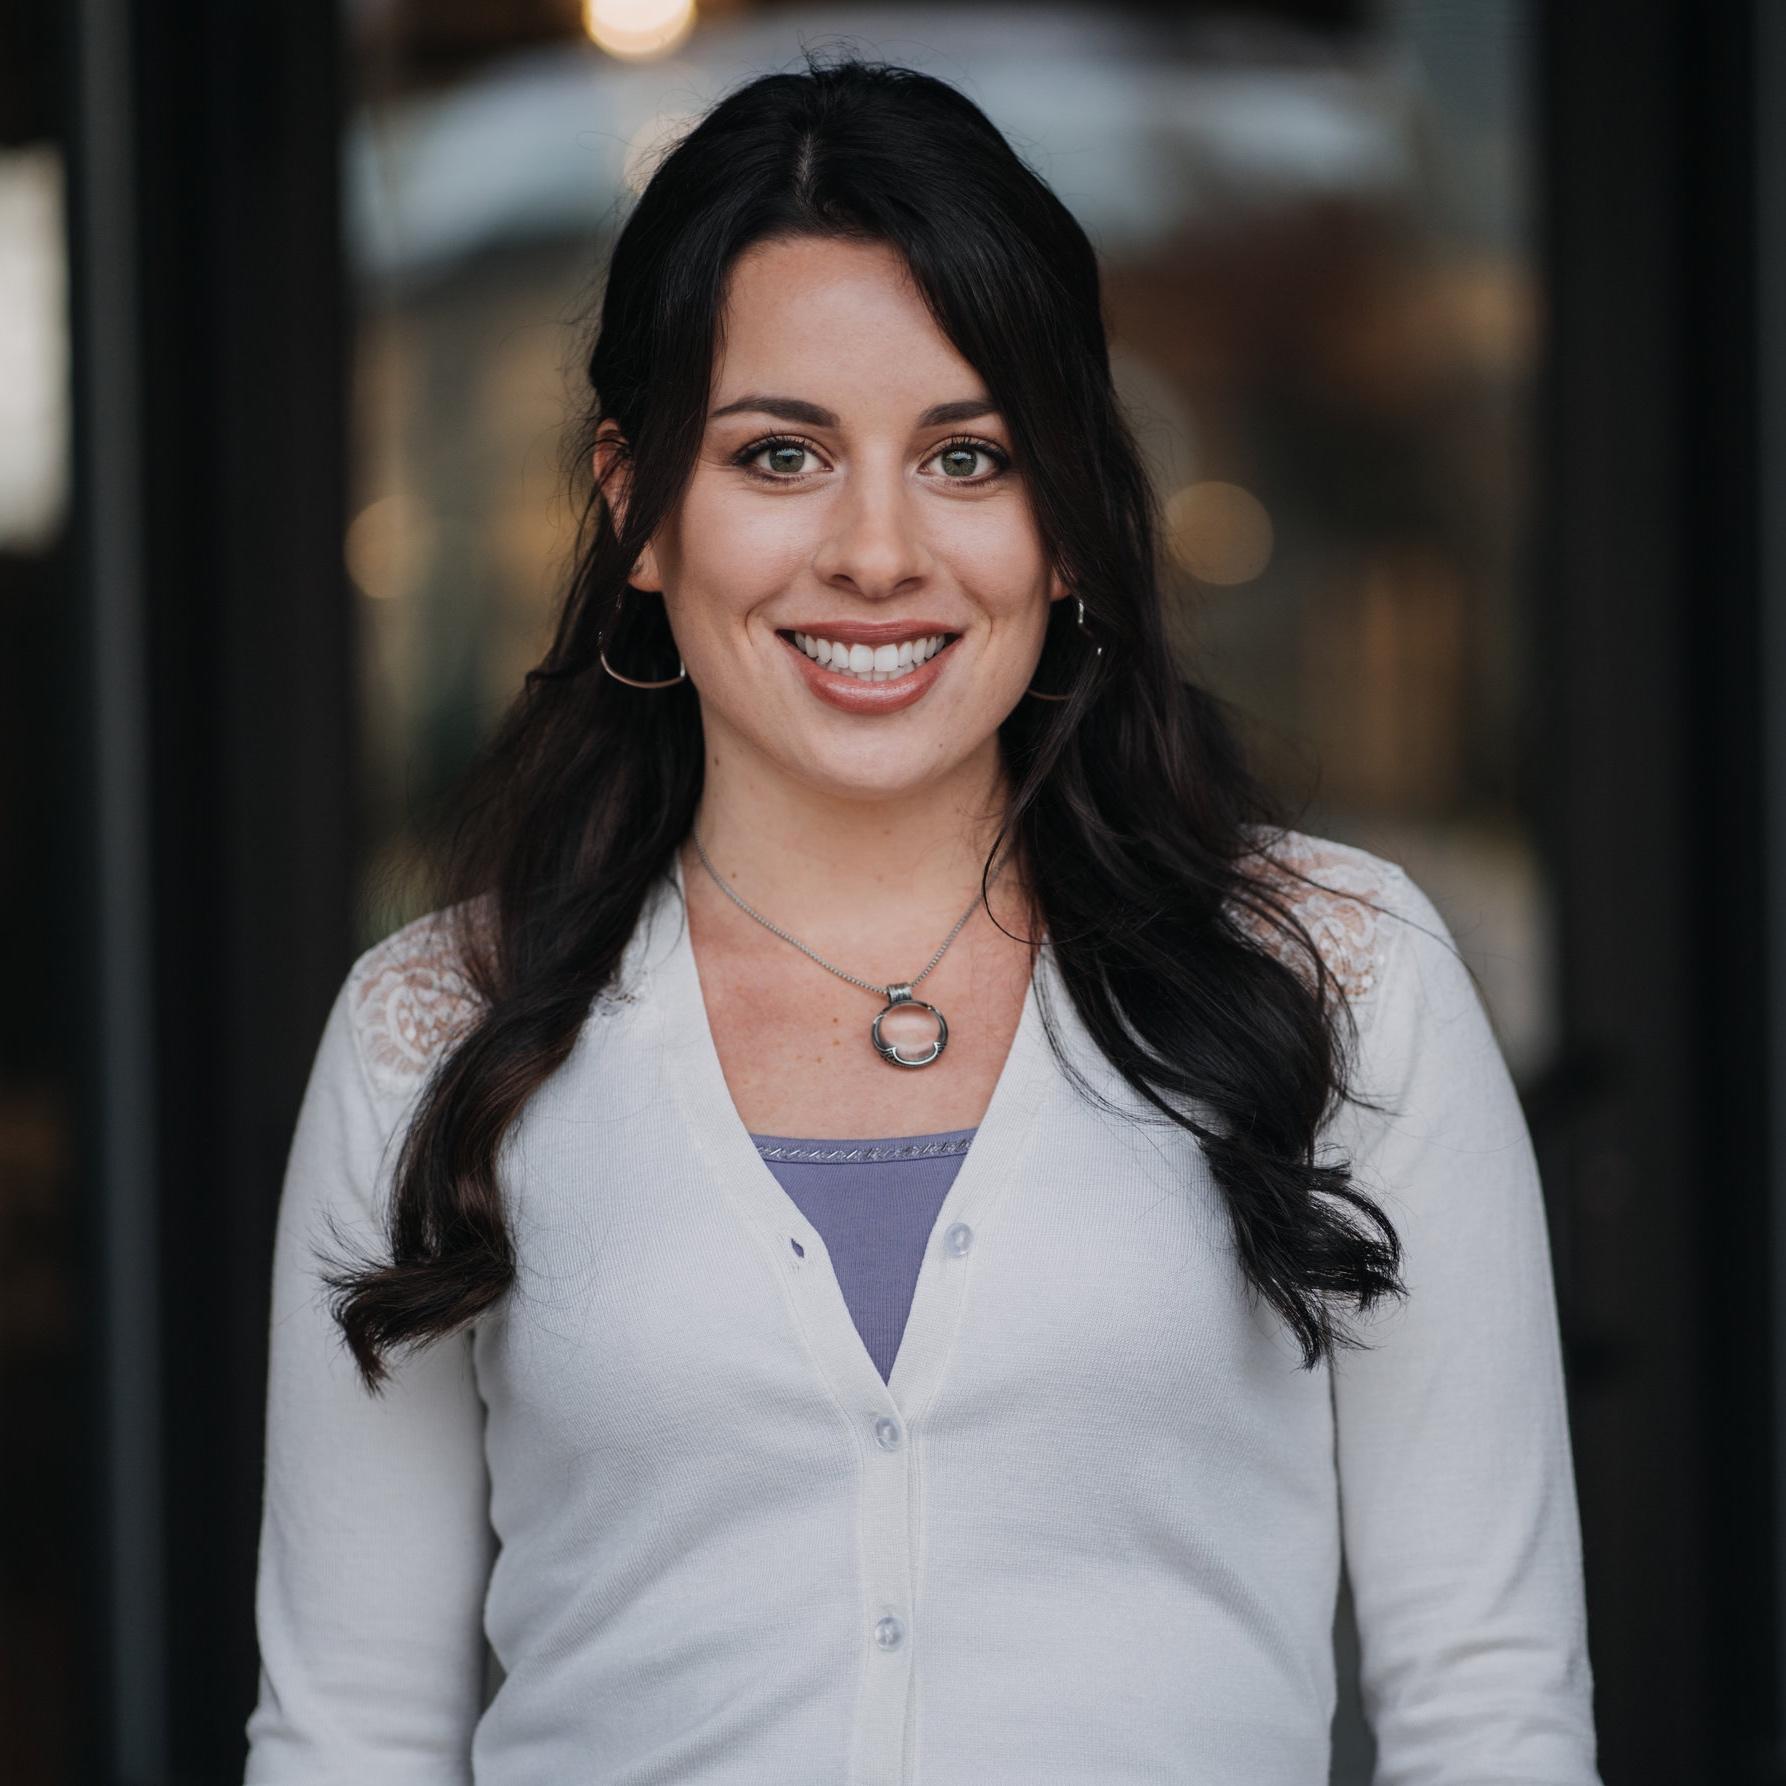 Grace D. - assistant designer / sales advisor